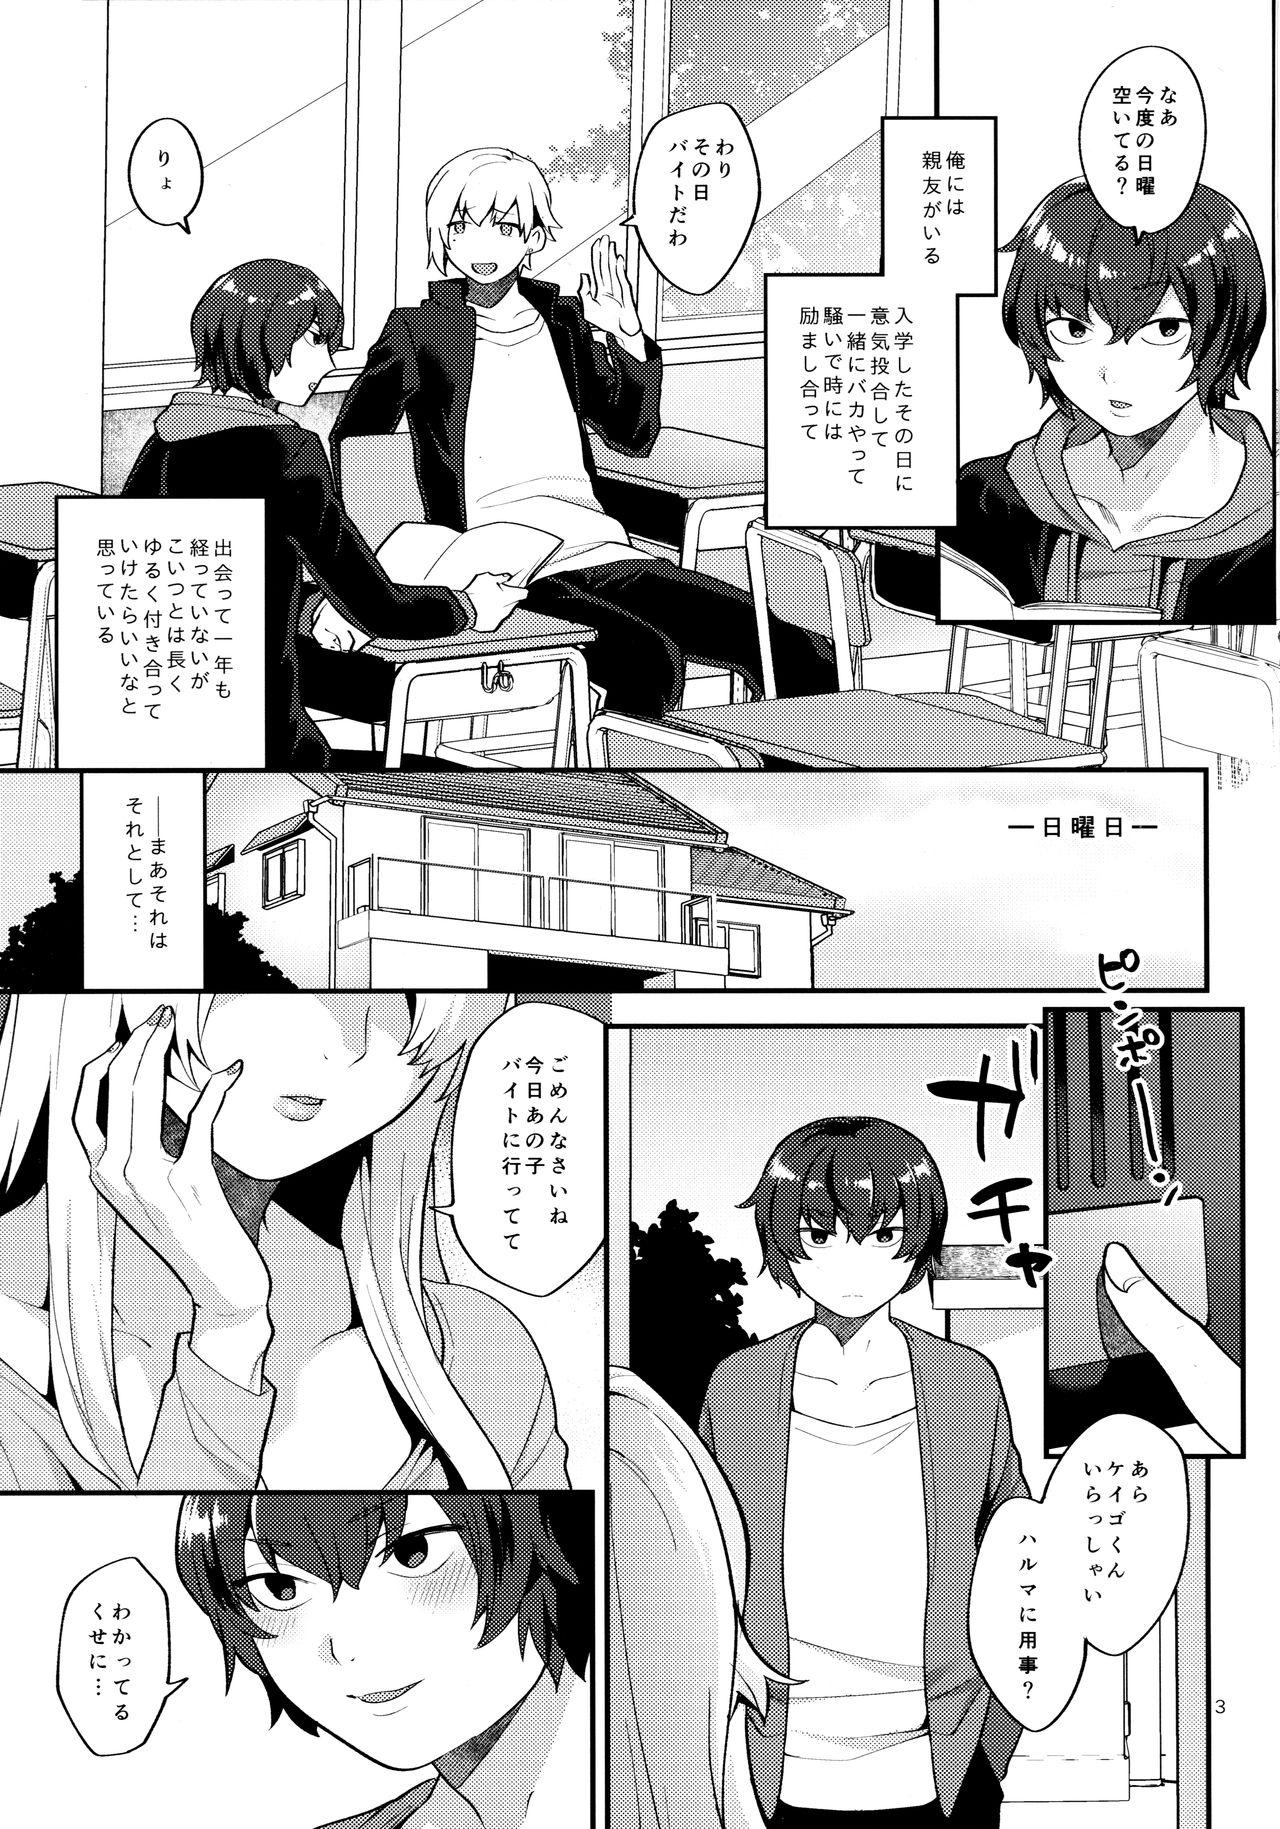 Shemale Single Mother no Yukari-san 1